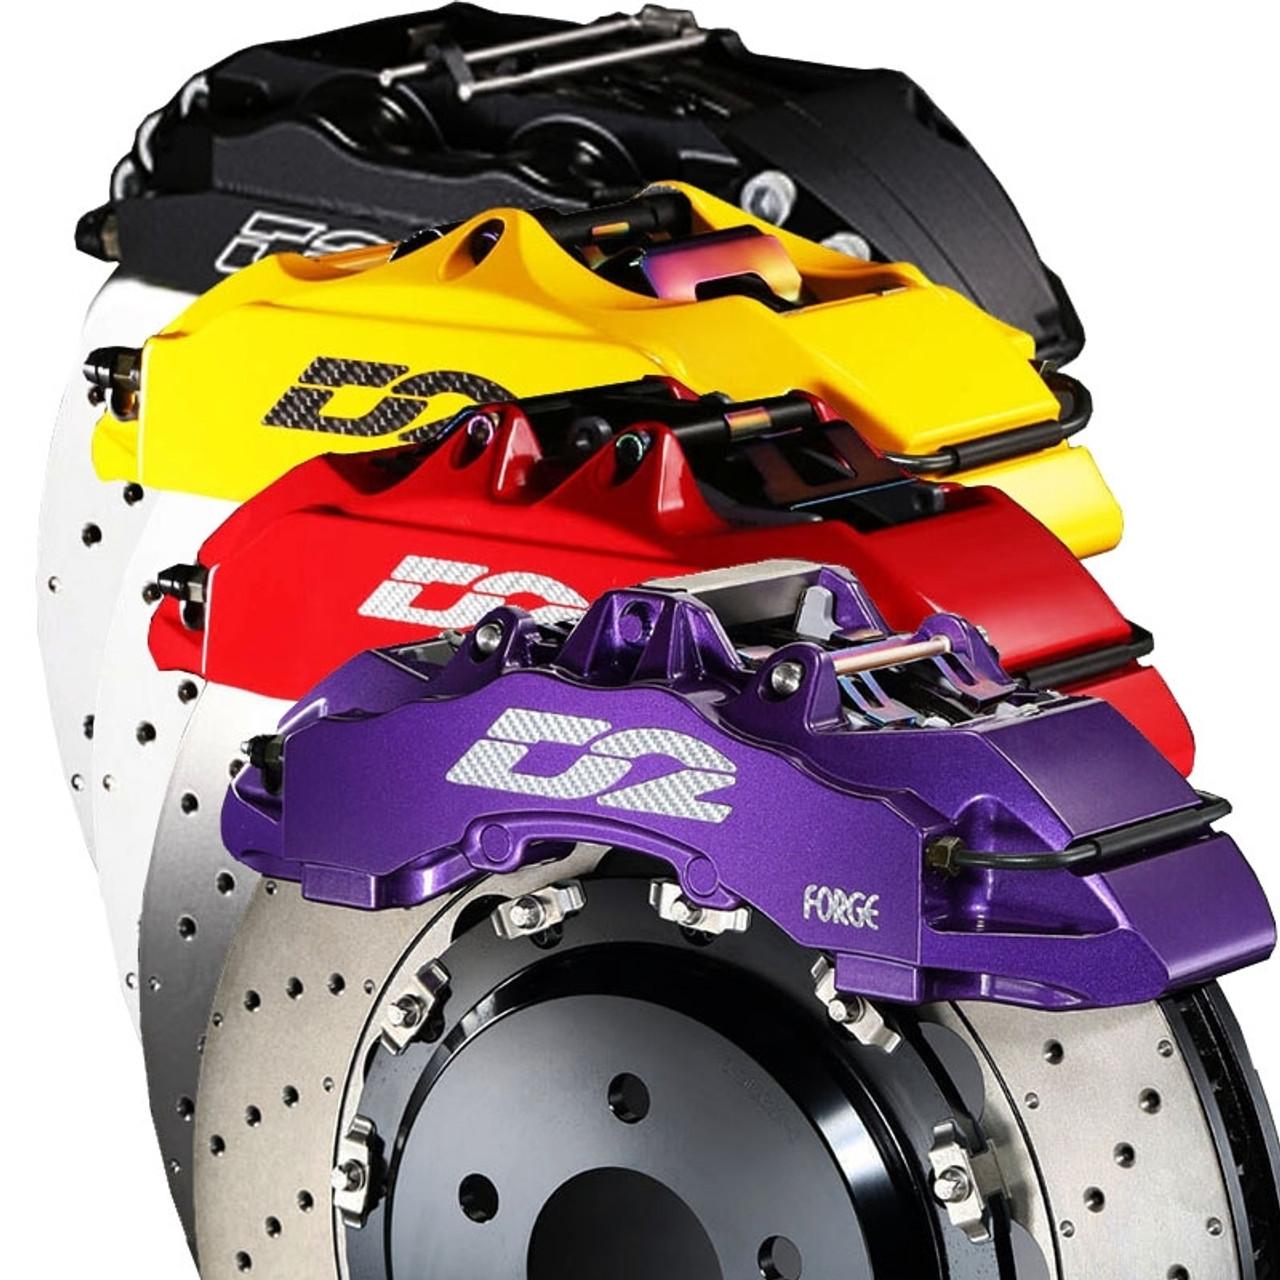 KT022432 Fits 2007-2009 Uplander Montana Premium Slotted Drilled Rotors + Ceramic Pads Max Brakes Rear Performance Brake Kit